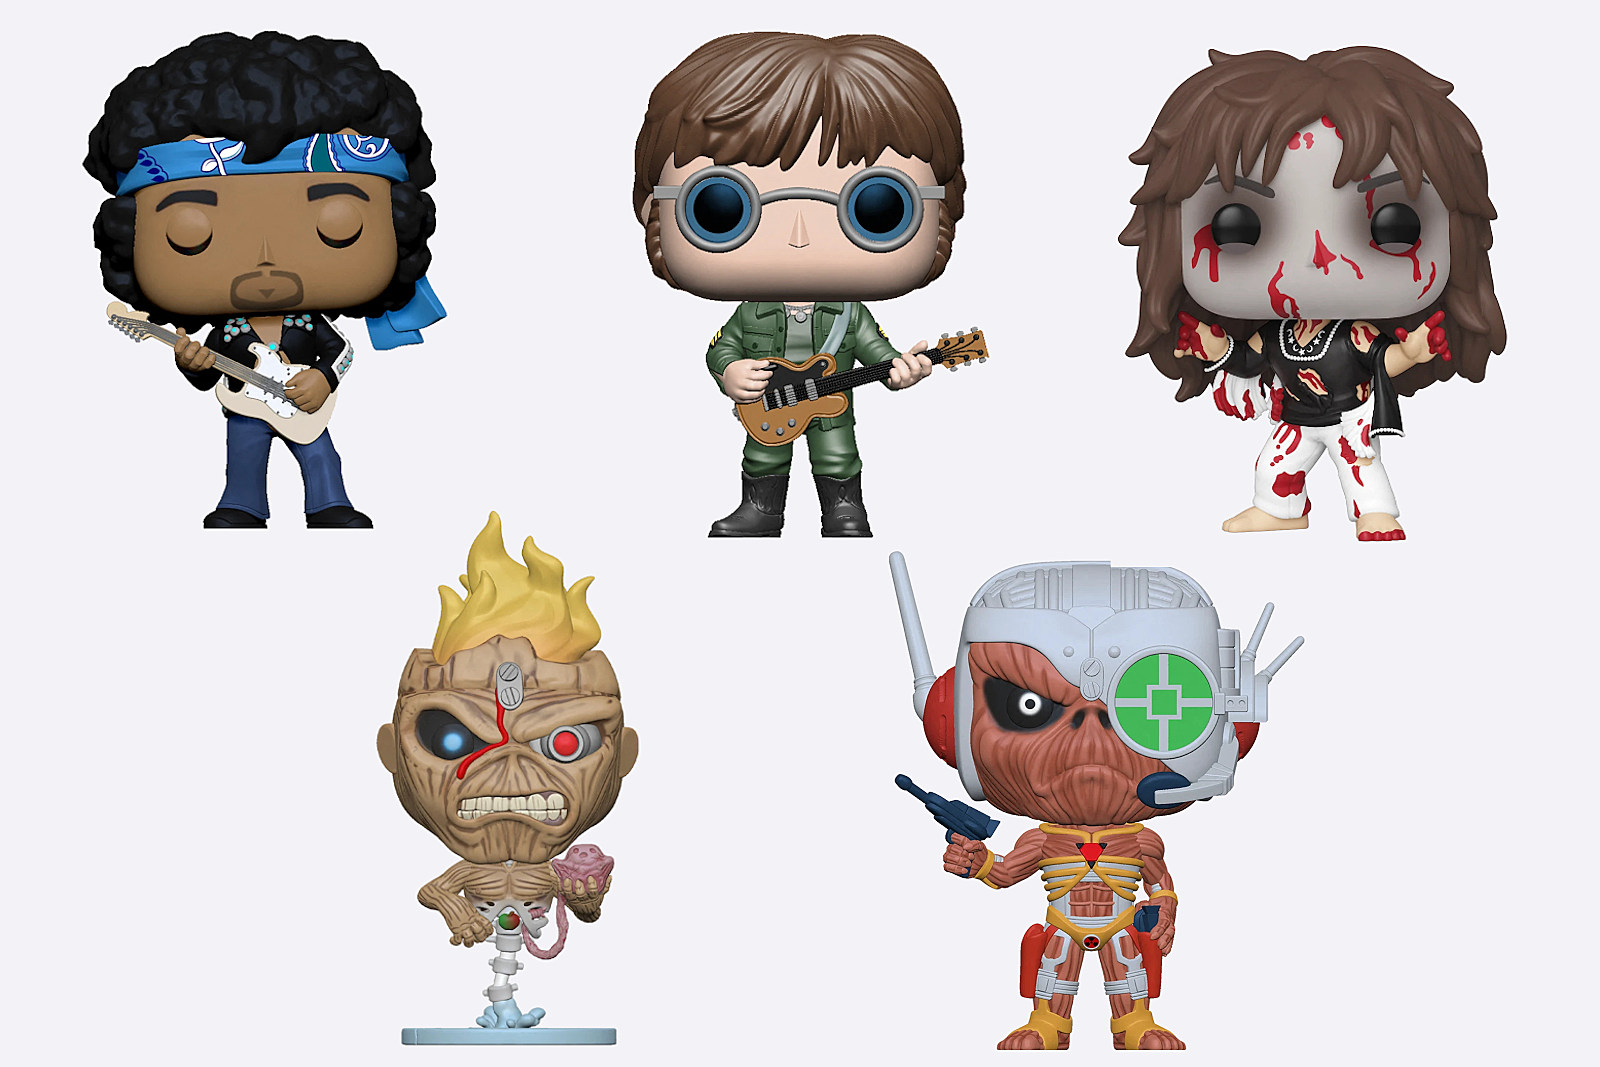 John Lennon, Ozzy and Iron Maiden Among New Funko Figures